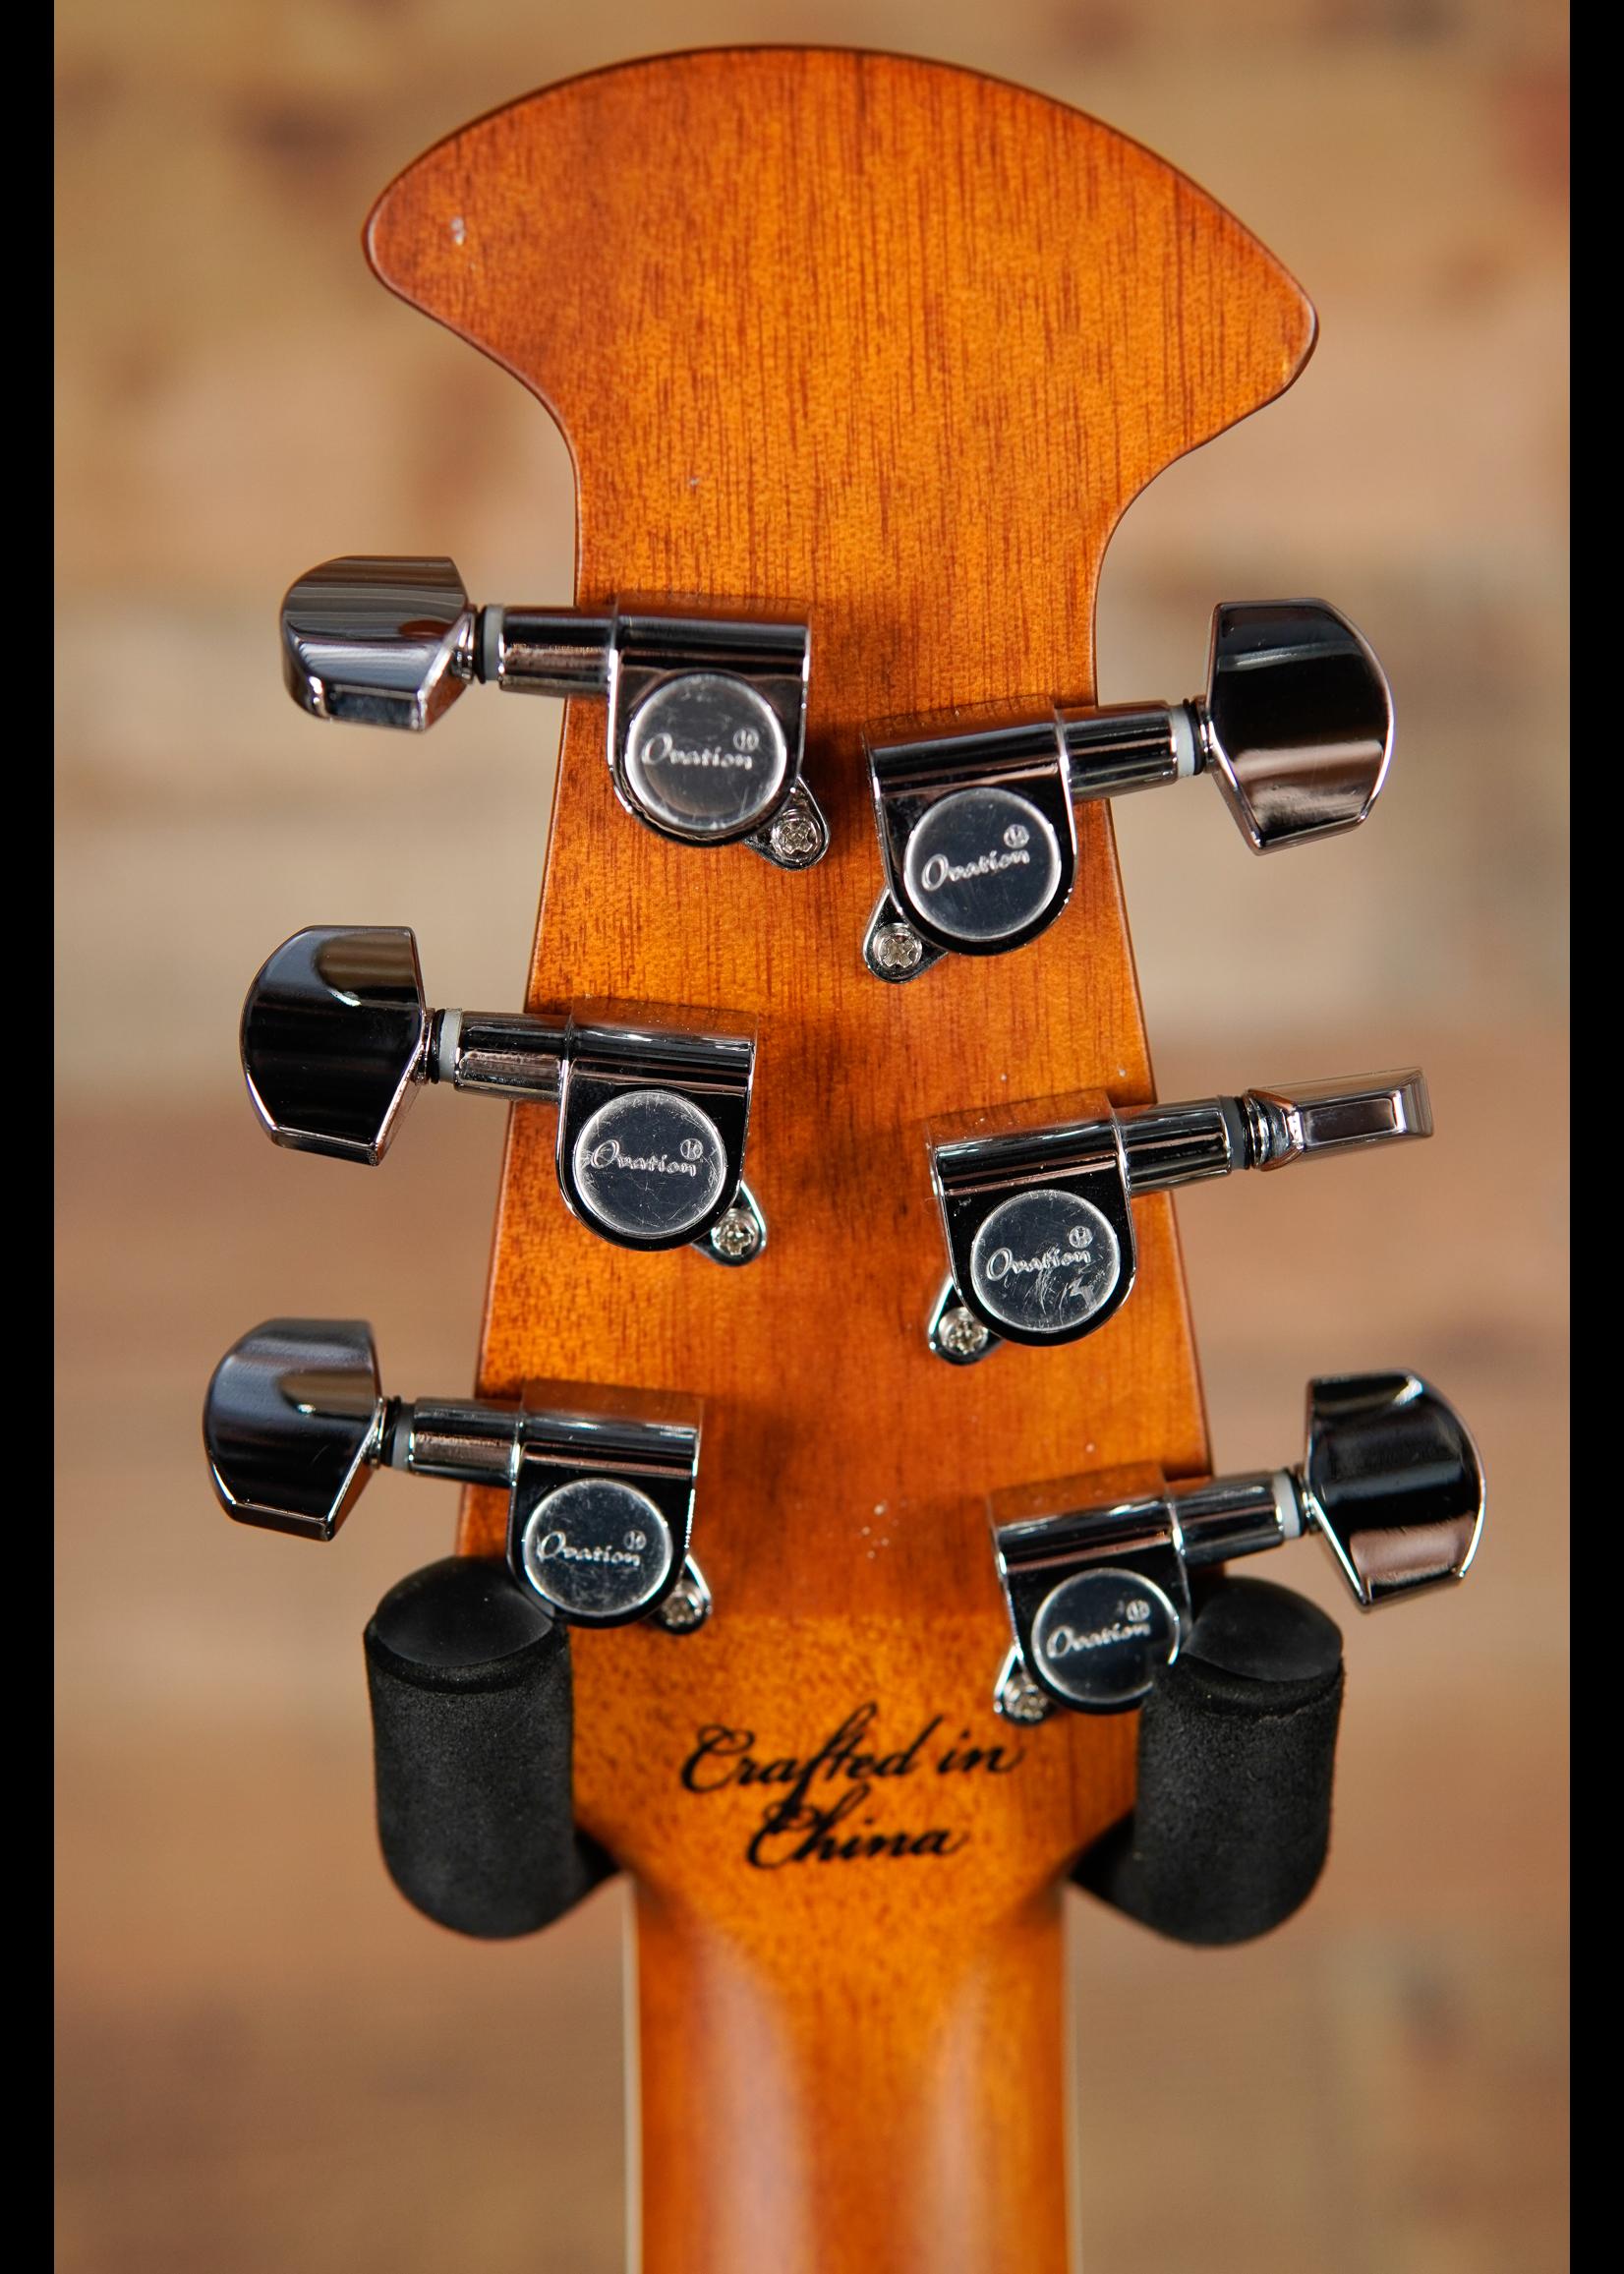 Ovation Ovation Celebrity Standard E-Acoustic Guitar CS24-RR, CS/Cutaway, Ruby Red, Mid-Depth